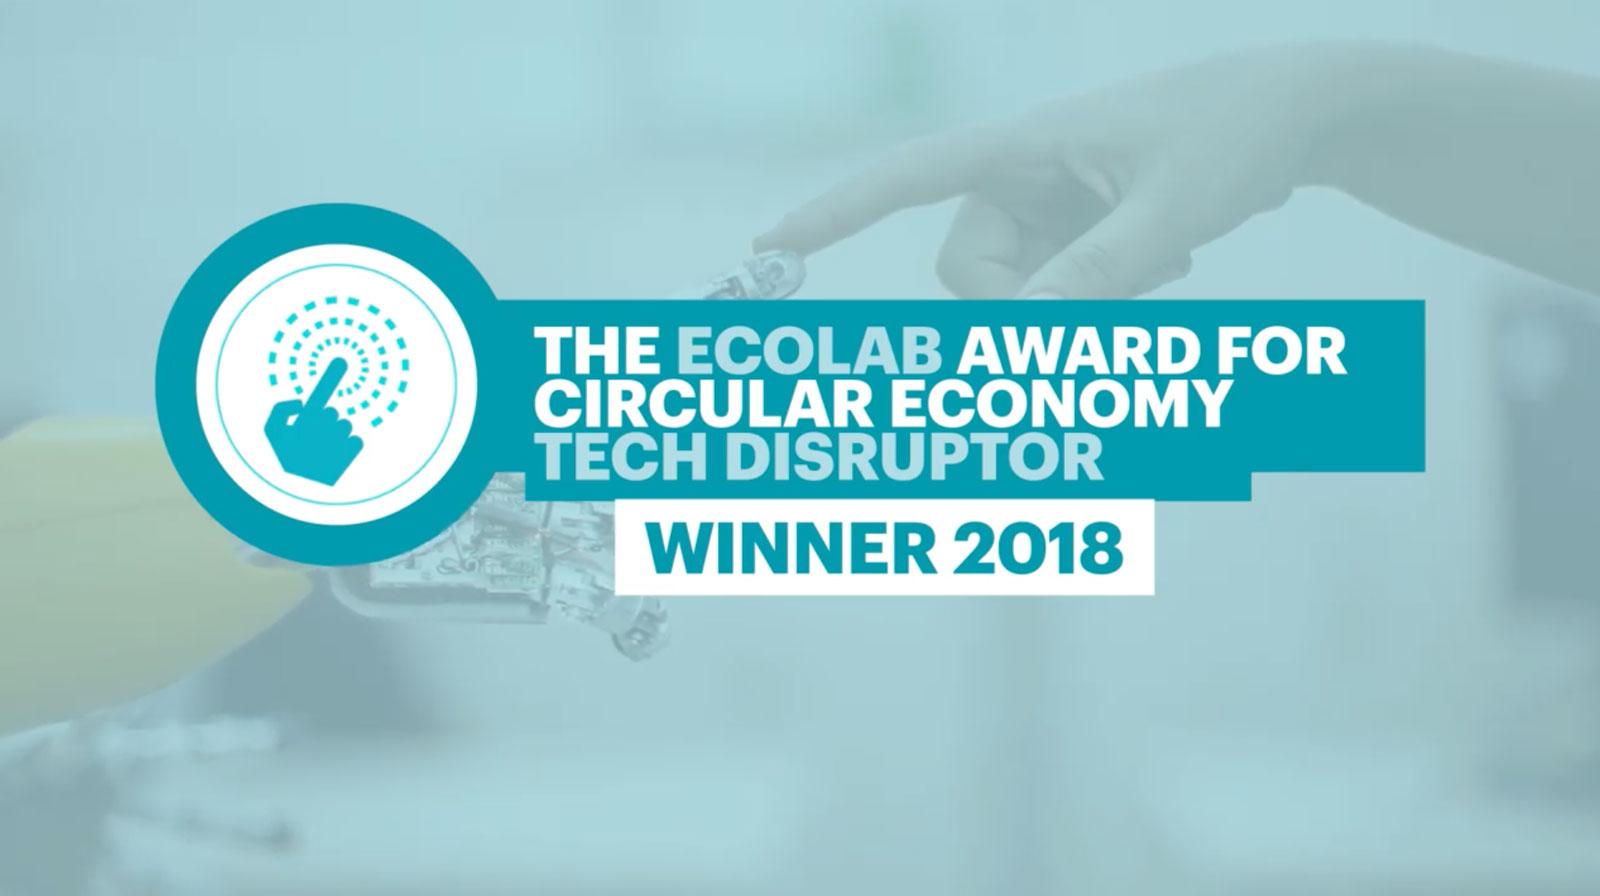 2018 Winner of the 'Circular Economy Tech Disruptor' Award